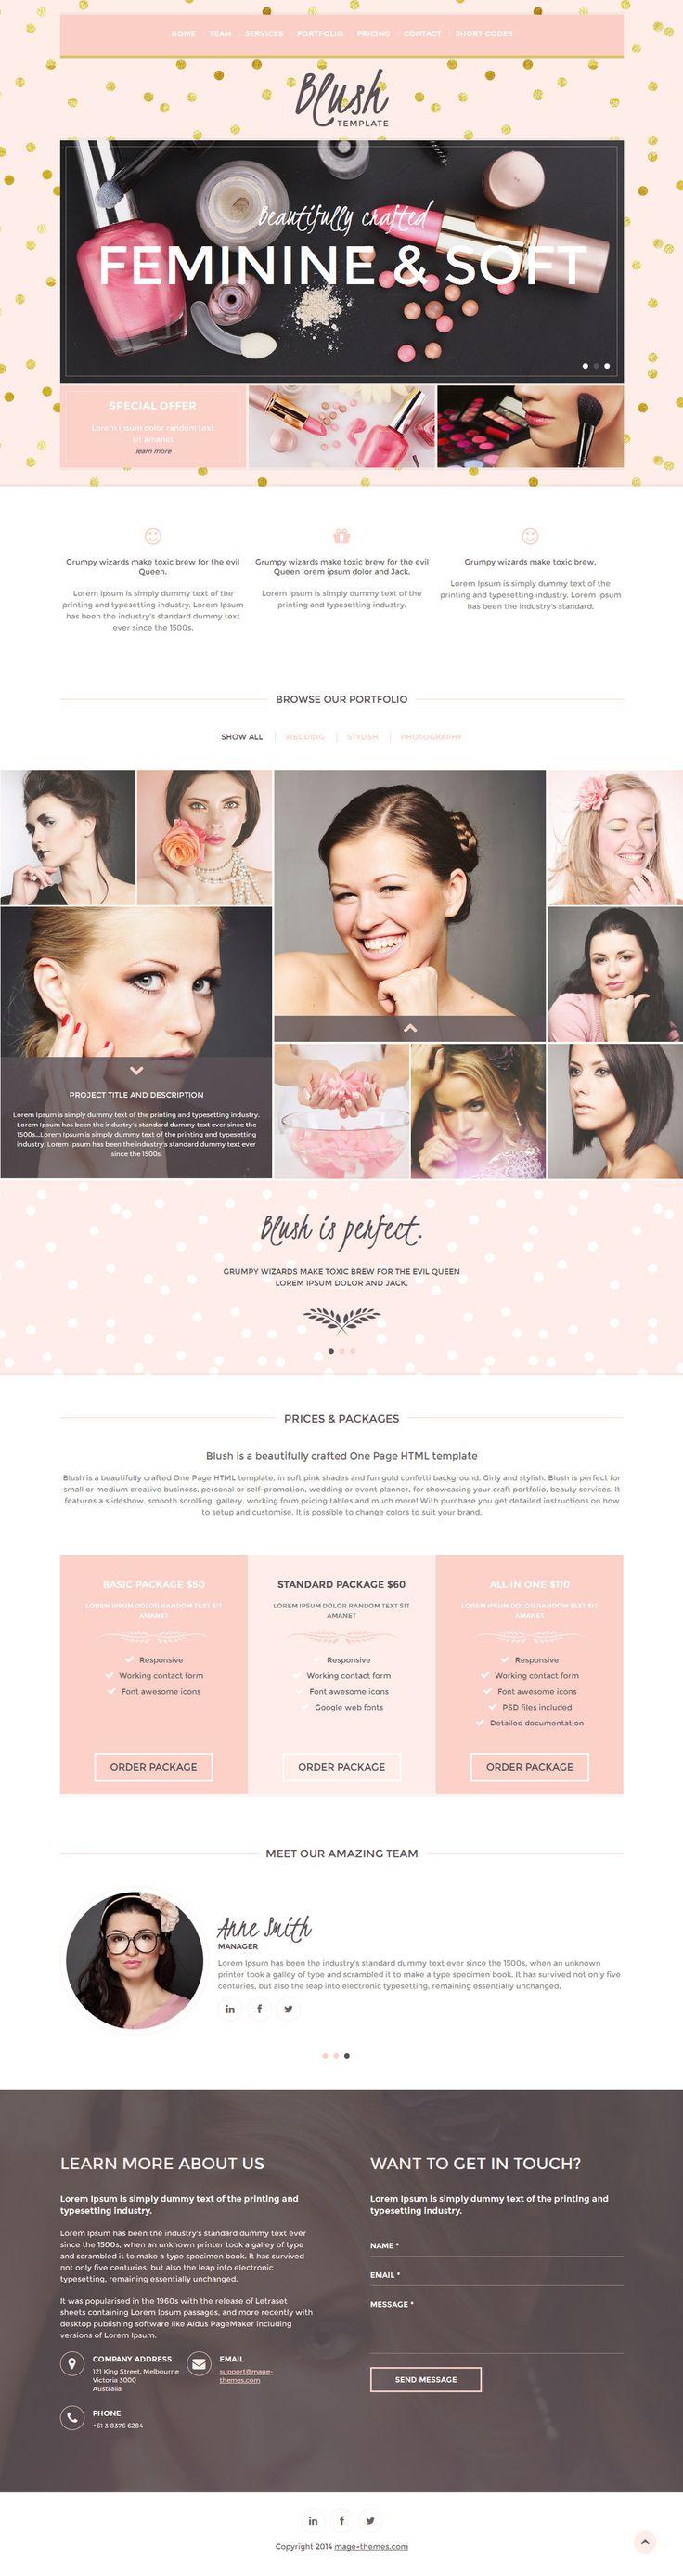 BLUSH multipurpose girly HTML template by pitrih.deviantart.com on @DeviantArt